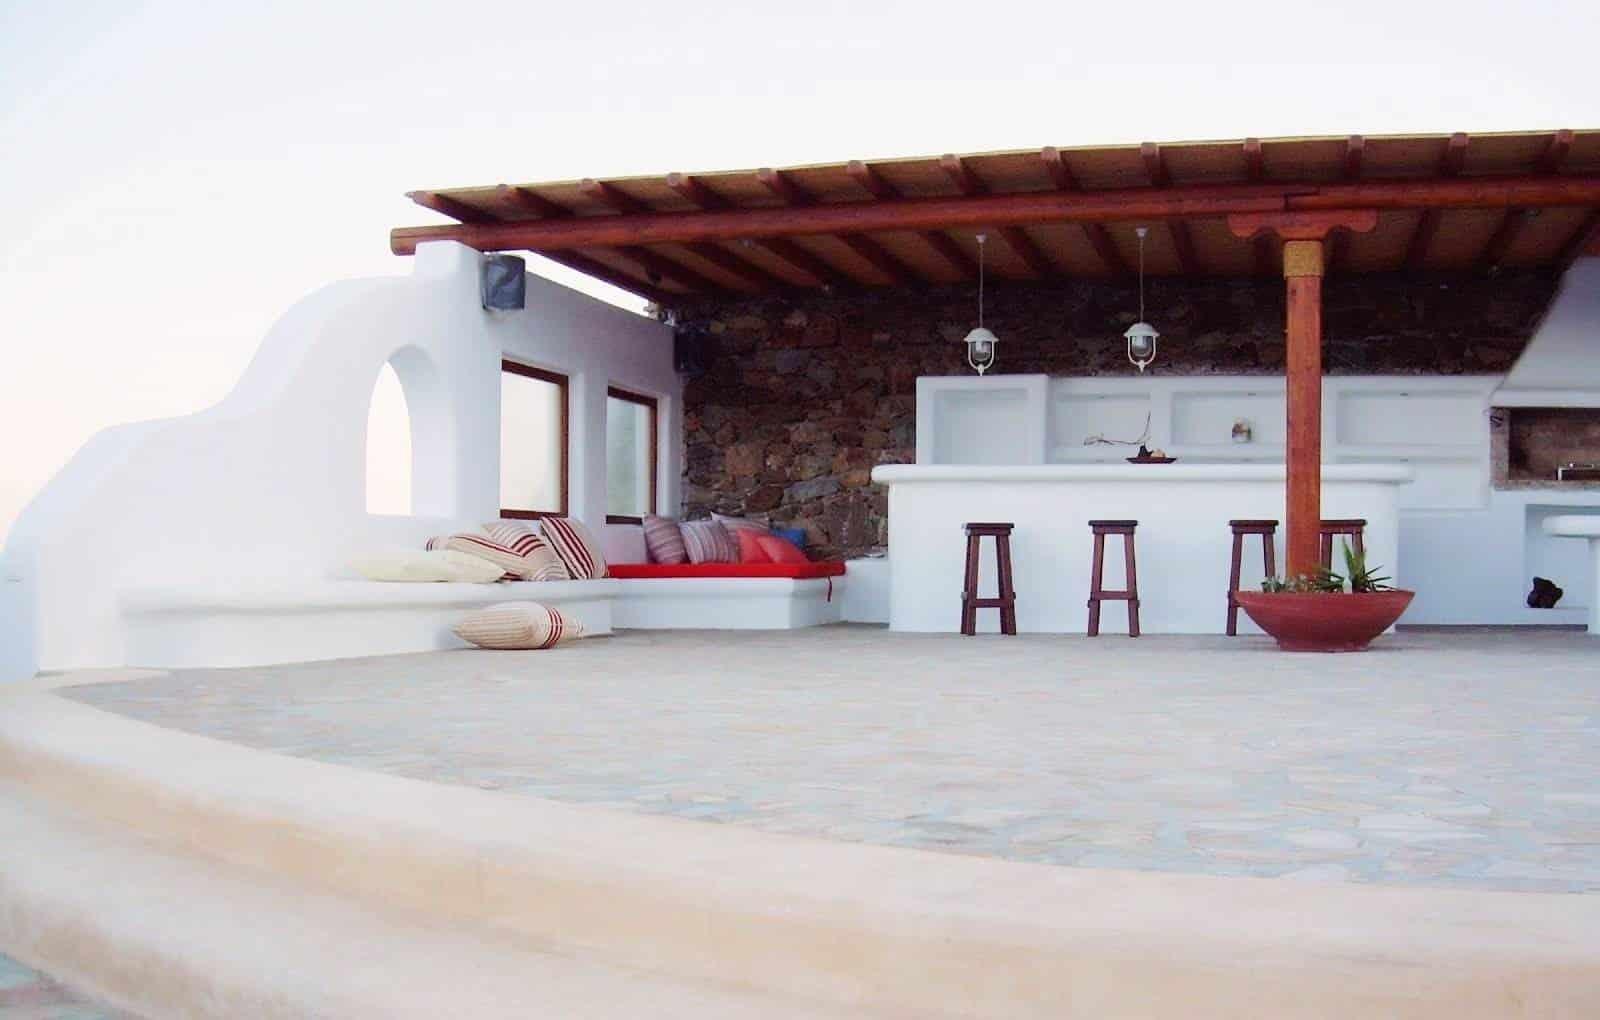 luxurious villa Mykonos - πολυτελής βίλα Μύκονος - mykonos services - οικοδομικές εργασίες 3